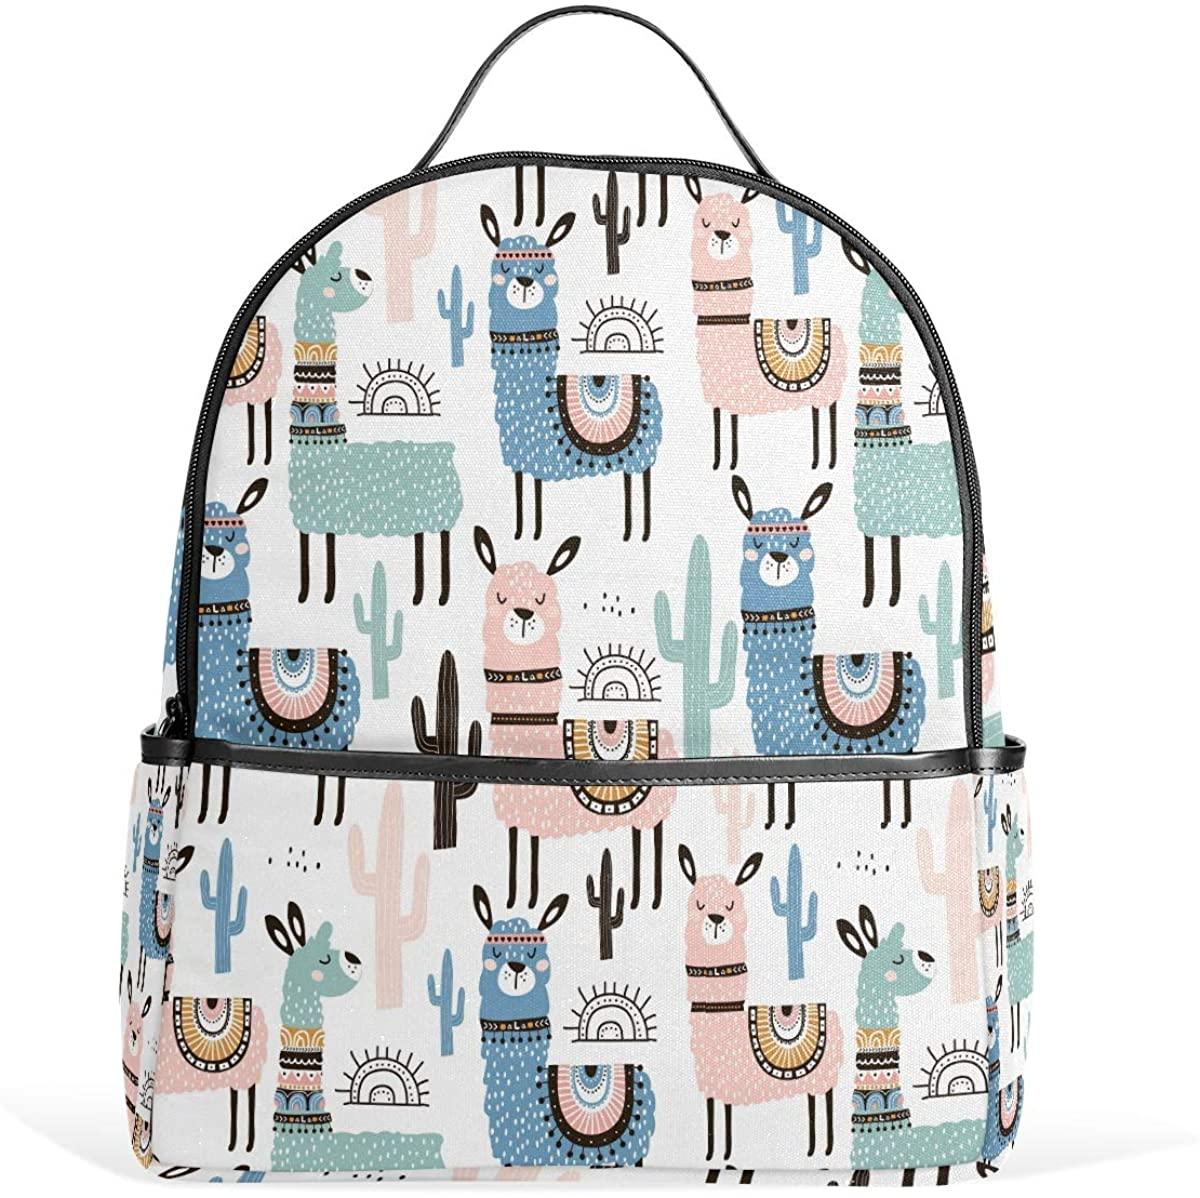 Toprint Backpack School Travel Bag Watercolor Casual Daypack Student Bookbag